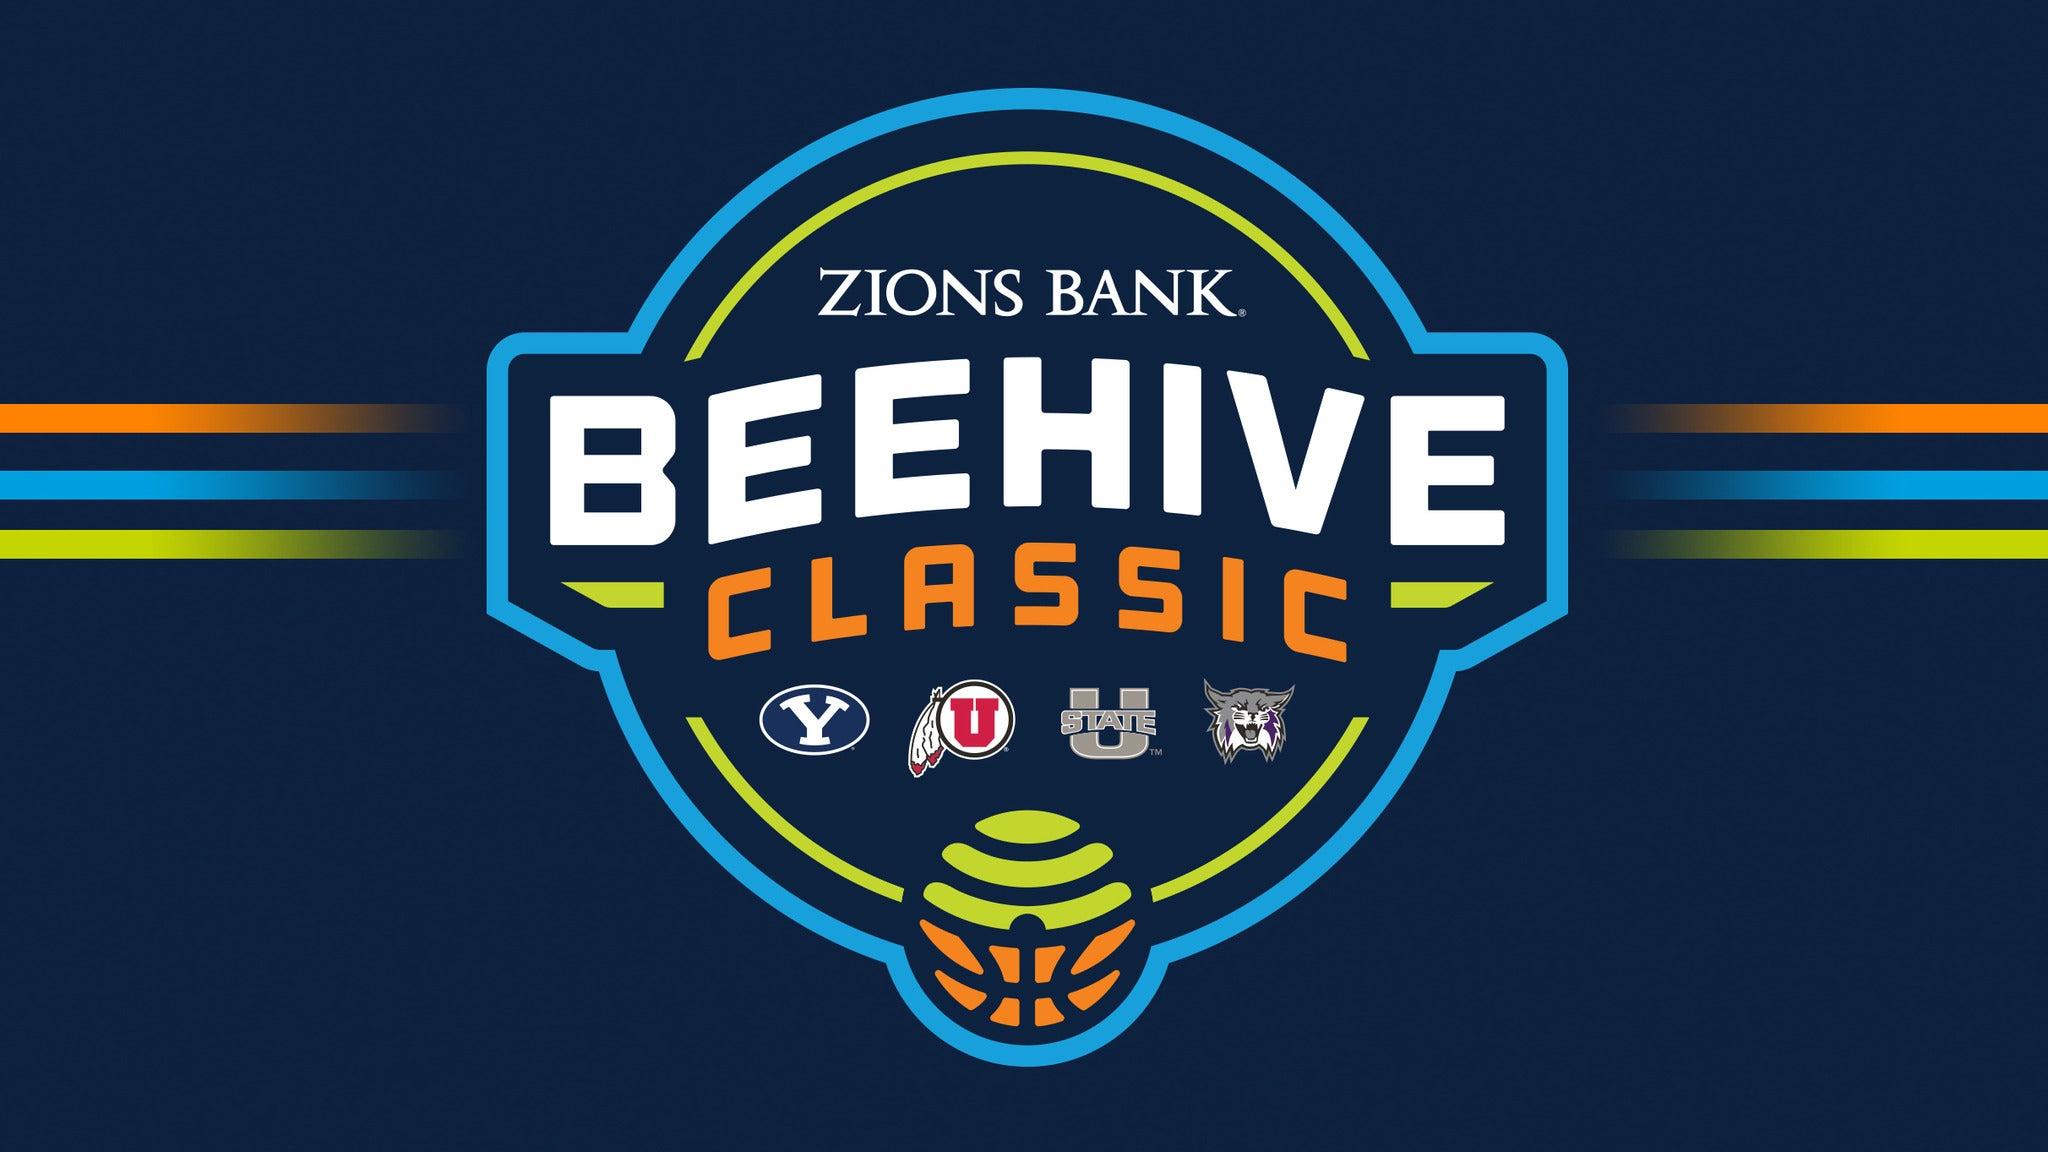 2019 Beehive Classic - BYU vs. Utah State